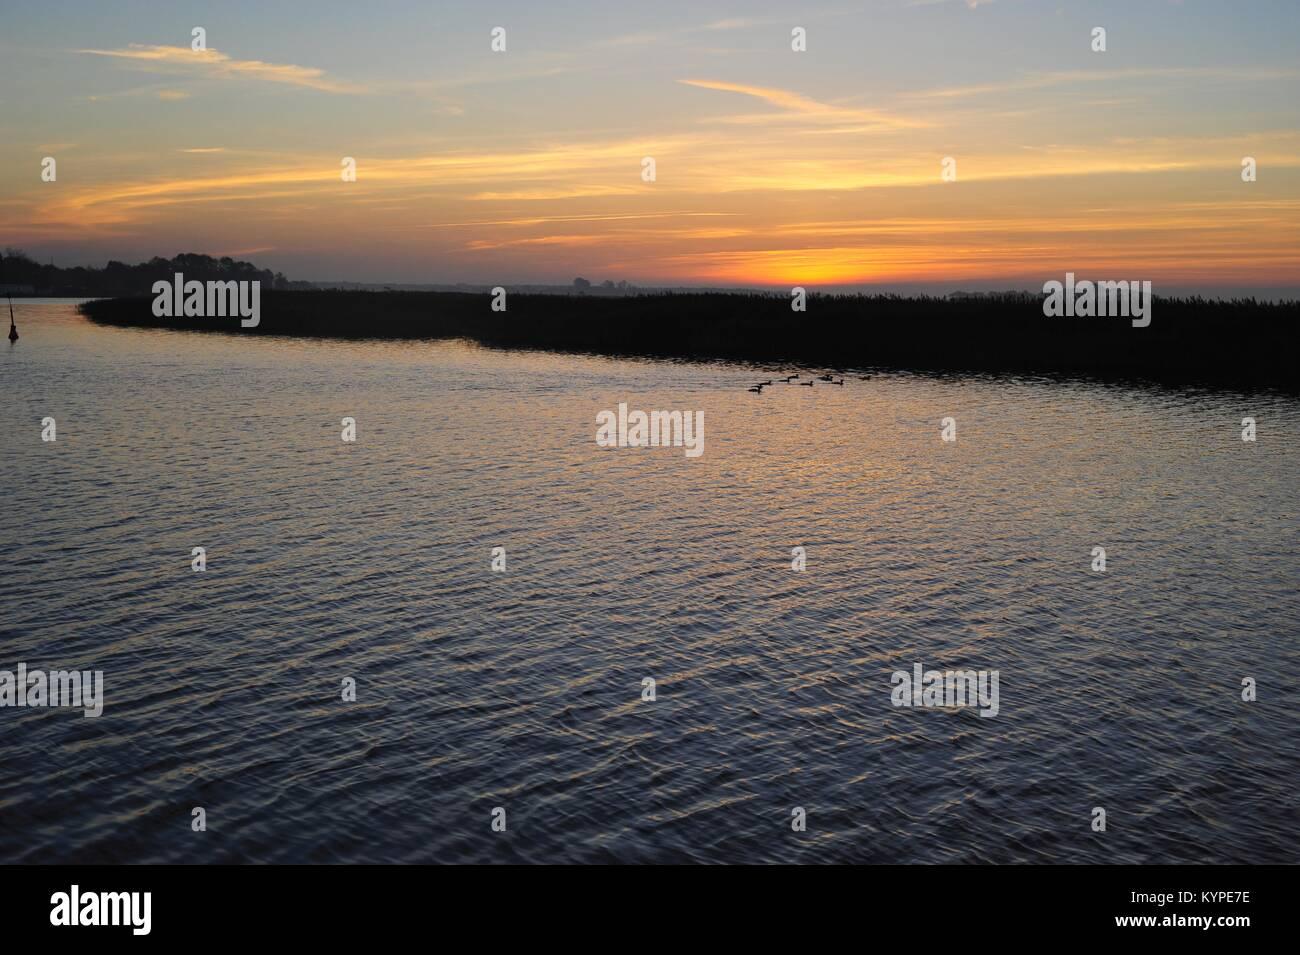 Sonnenuntergang über der Ostsee im Frühjahr Stockbild